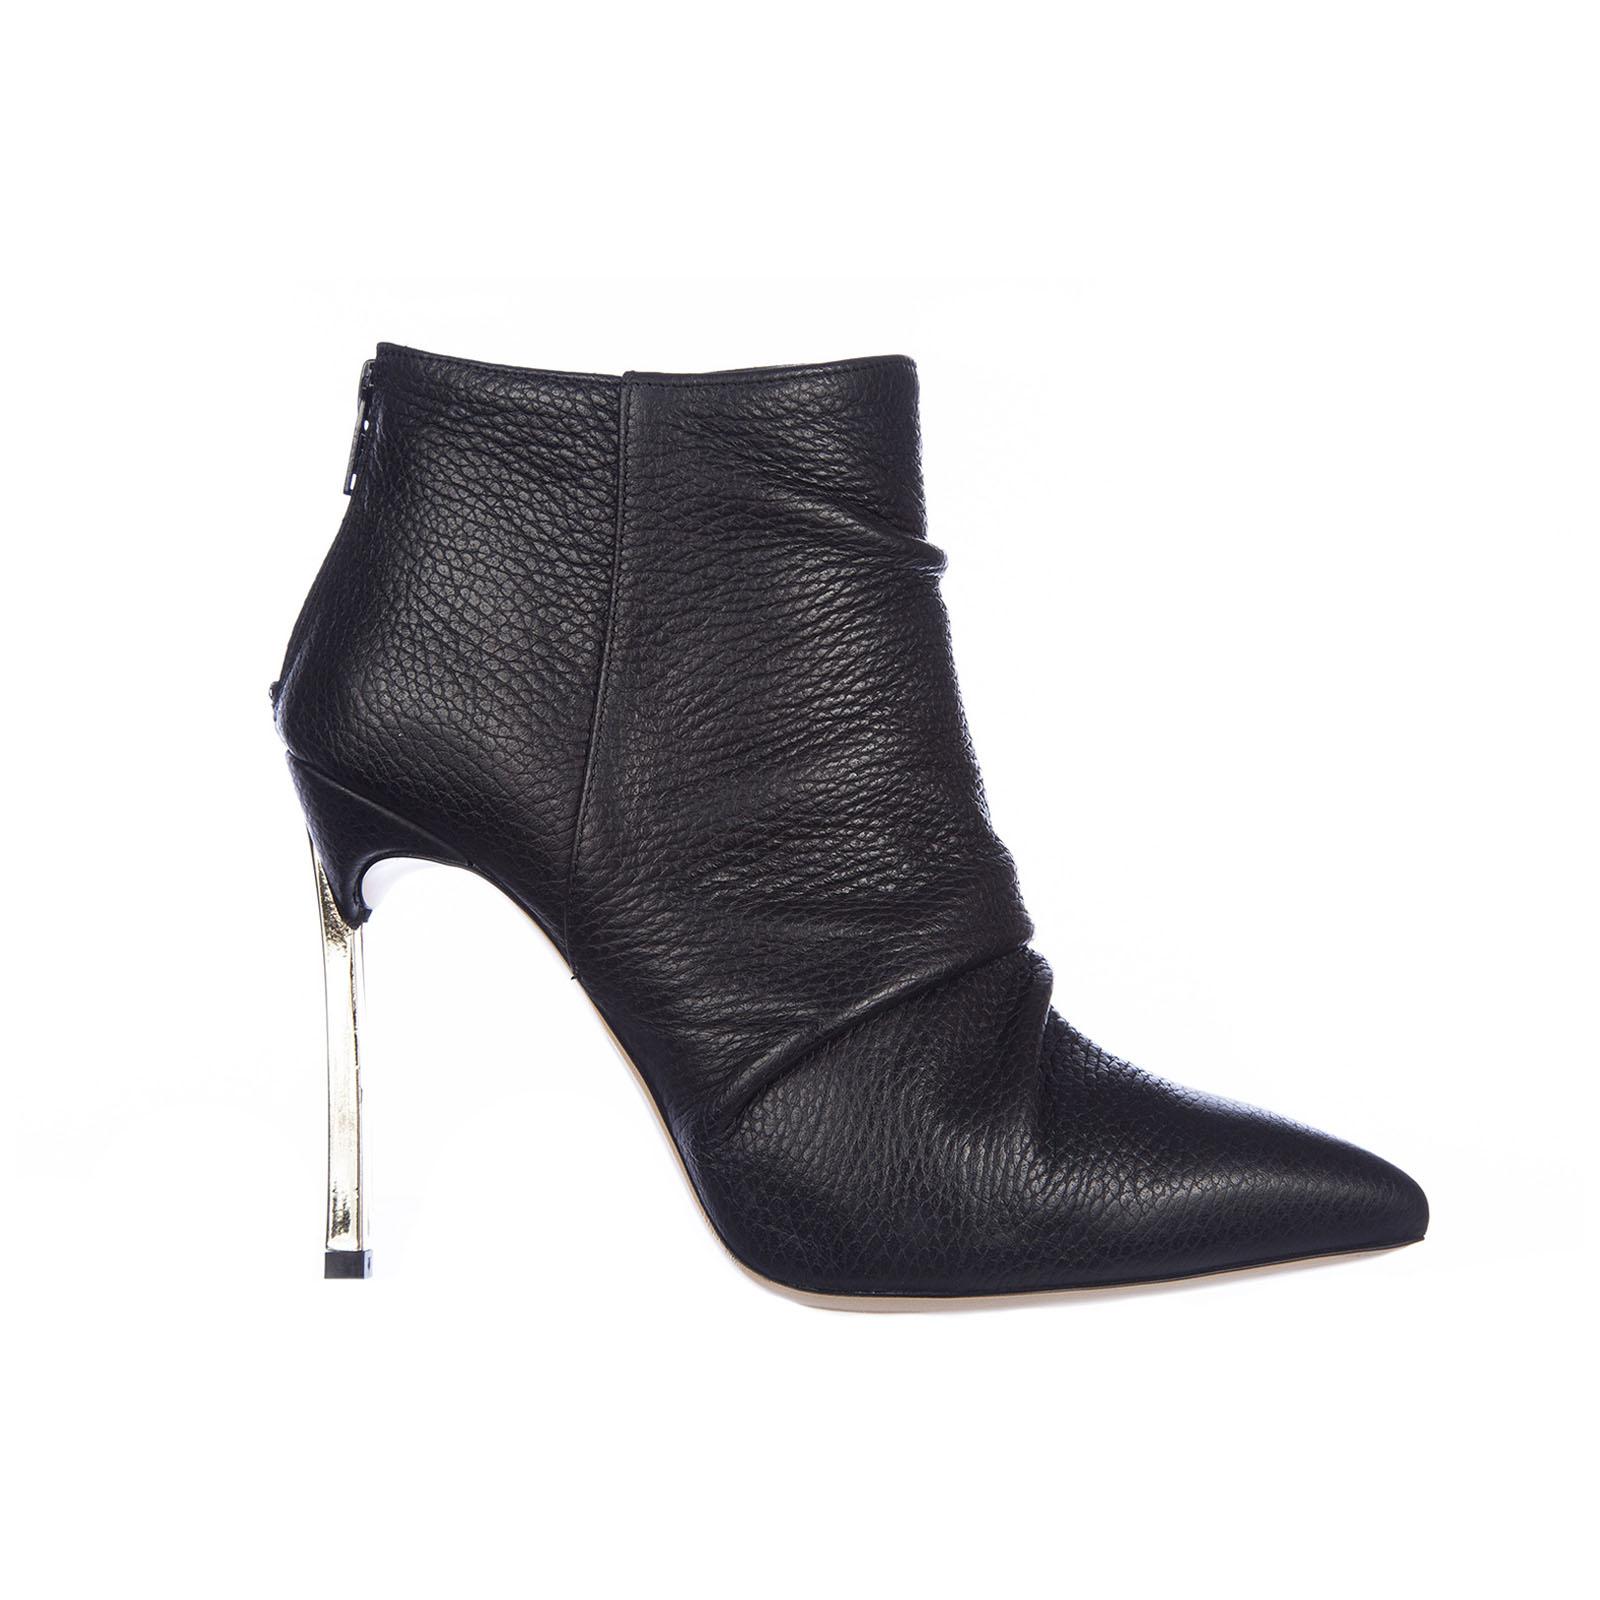 Tronchetti stivaletti donna in pelle zip heel